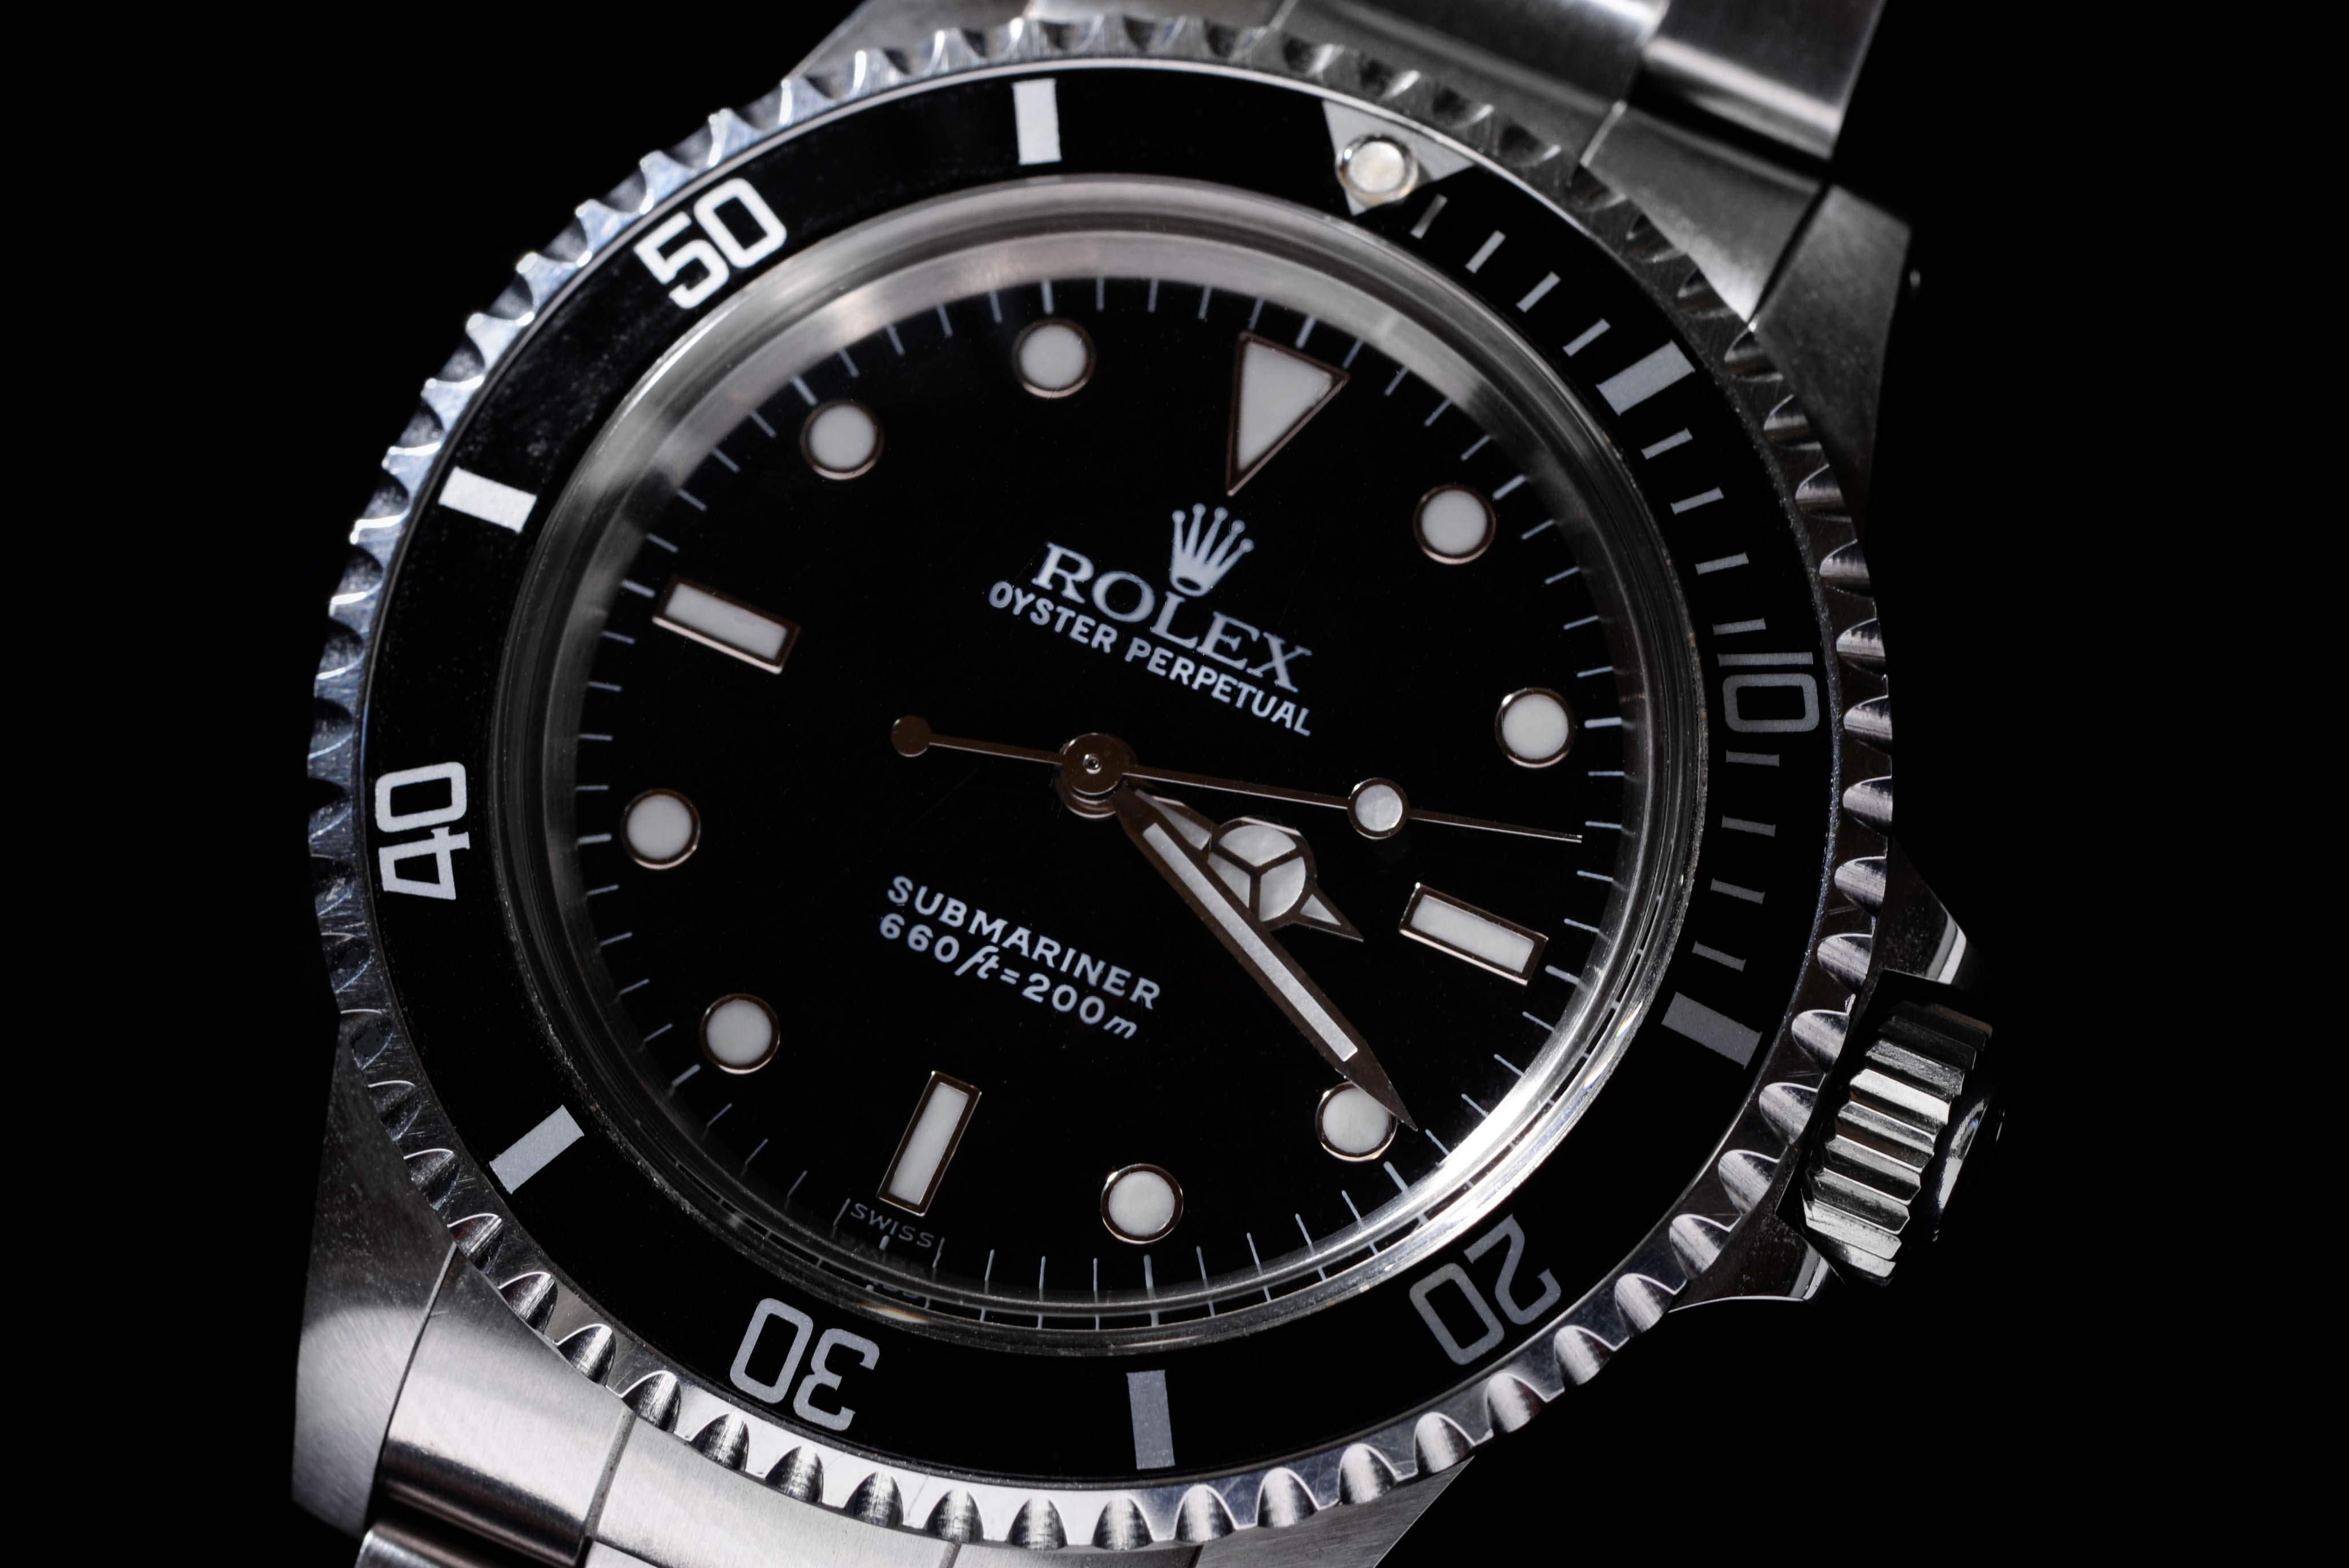 kazefukuyoruniさんの腕時計はロレックス サブマリーナ Ref.5513